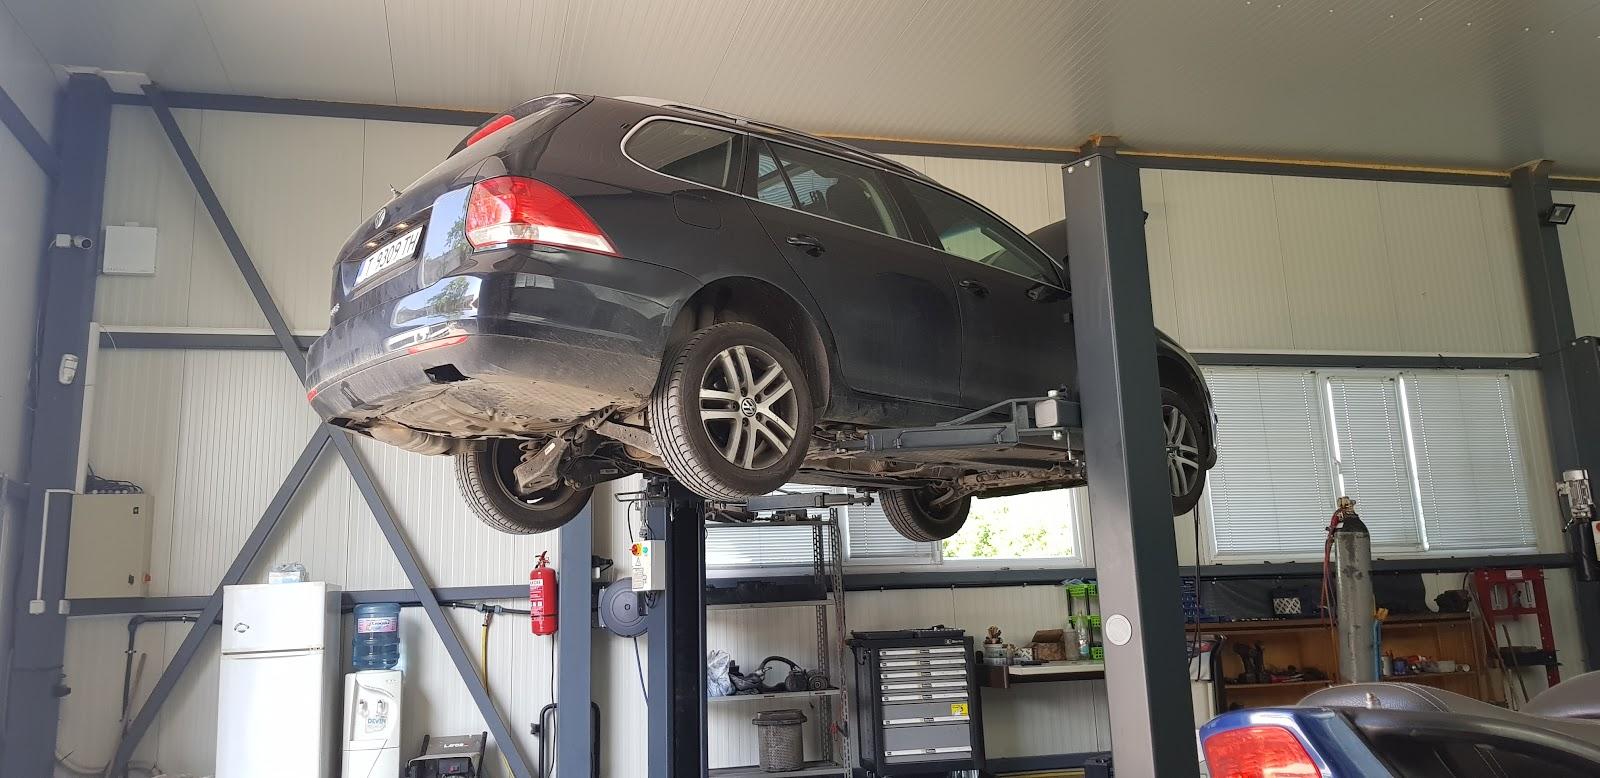 Auto airconditioning